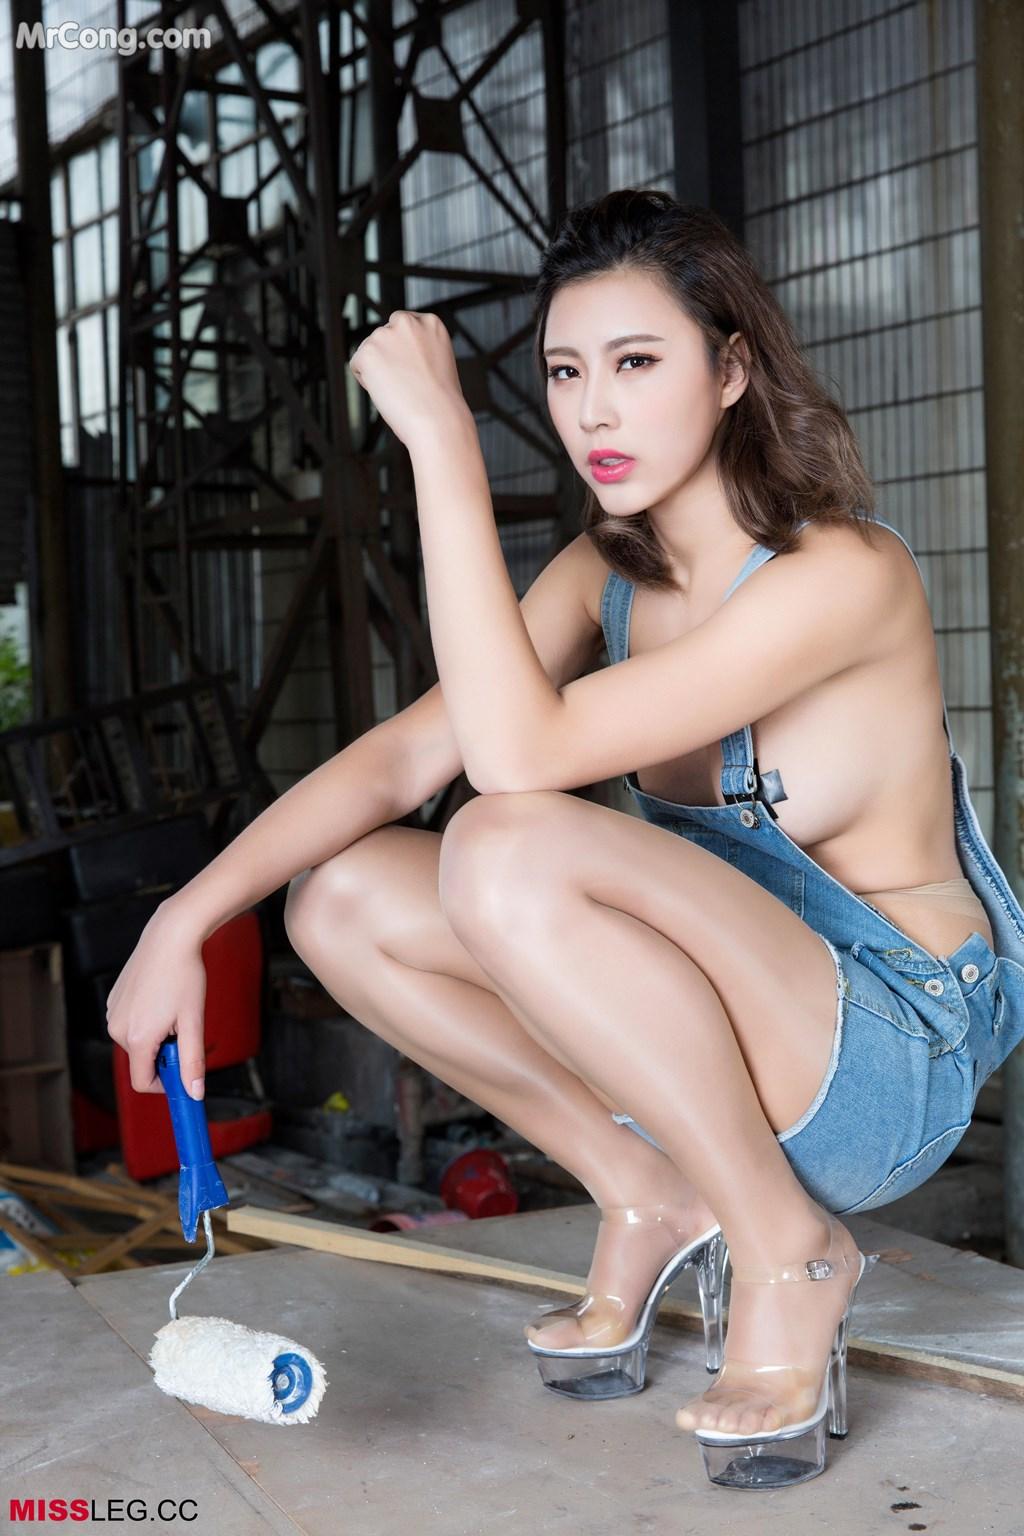 Image MISSLEG-2017-03-29-Vol.005-Yao-Yao-MrCong.com-003 in post MISSLEG 2017-03-29 Vol.005: Người mẫu Yao Yao (瑶瑶) (15 ảnh + 1 video)